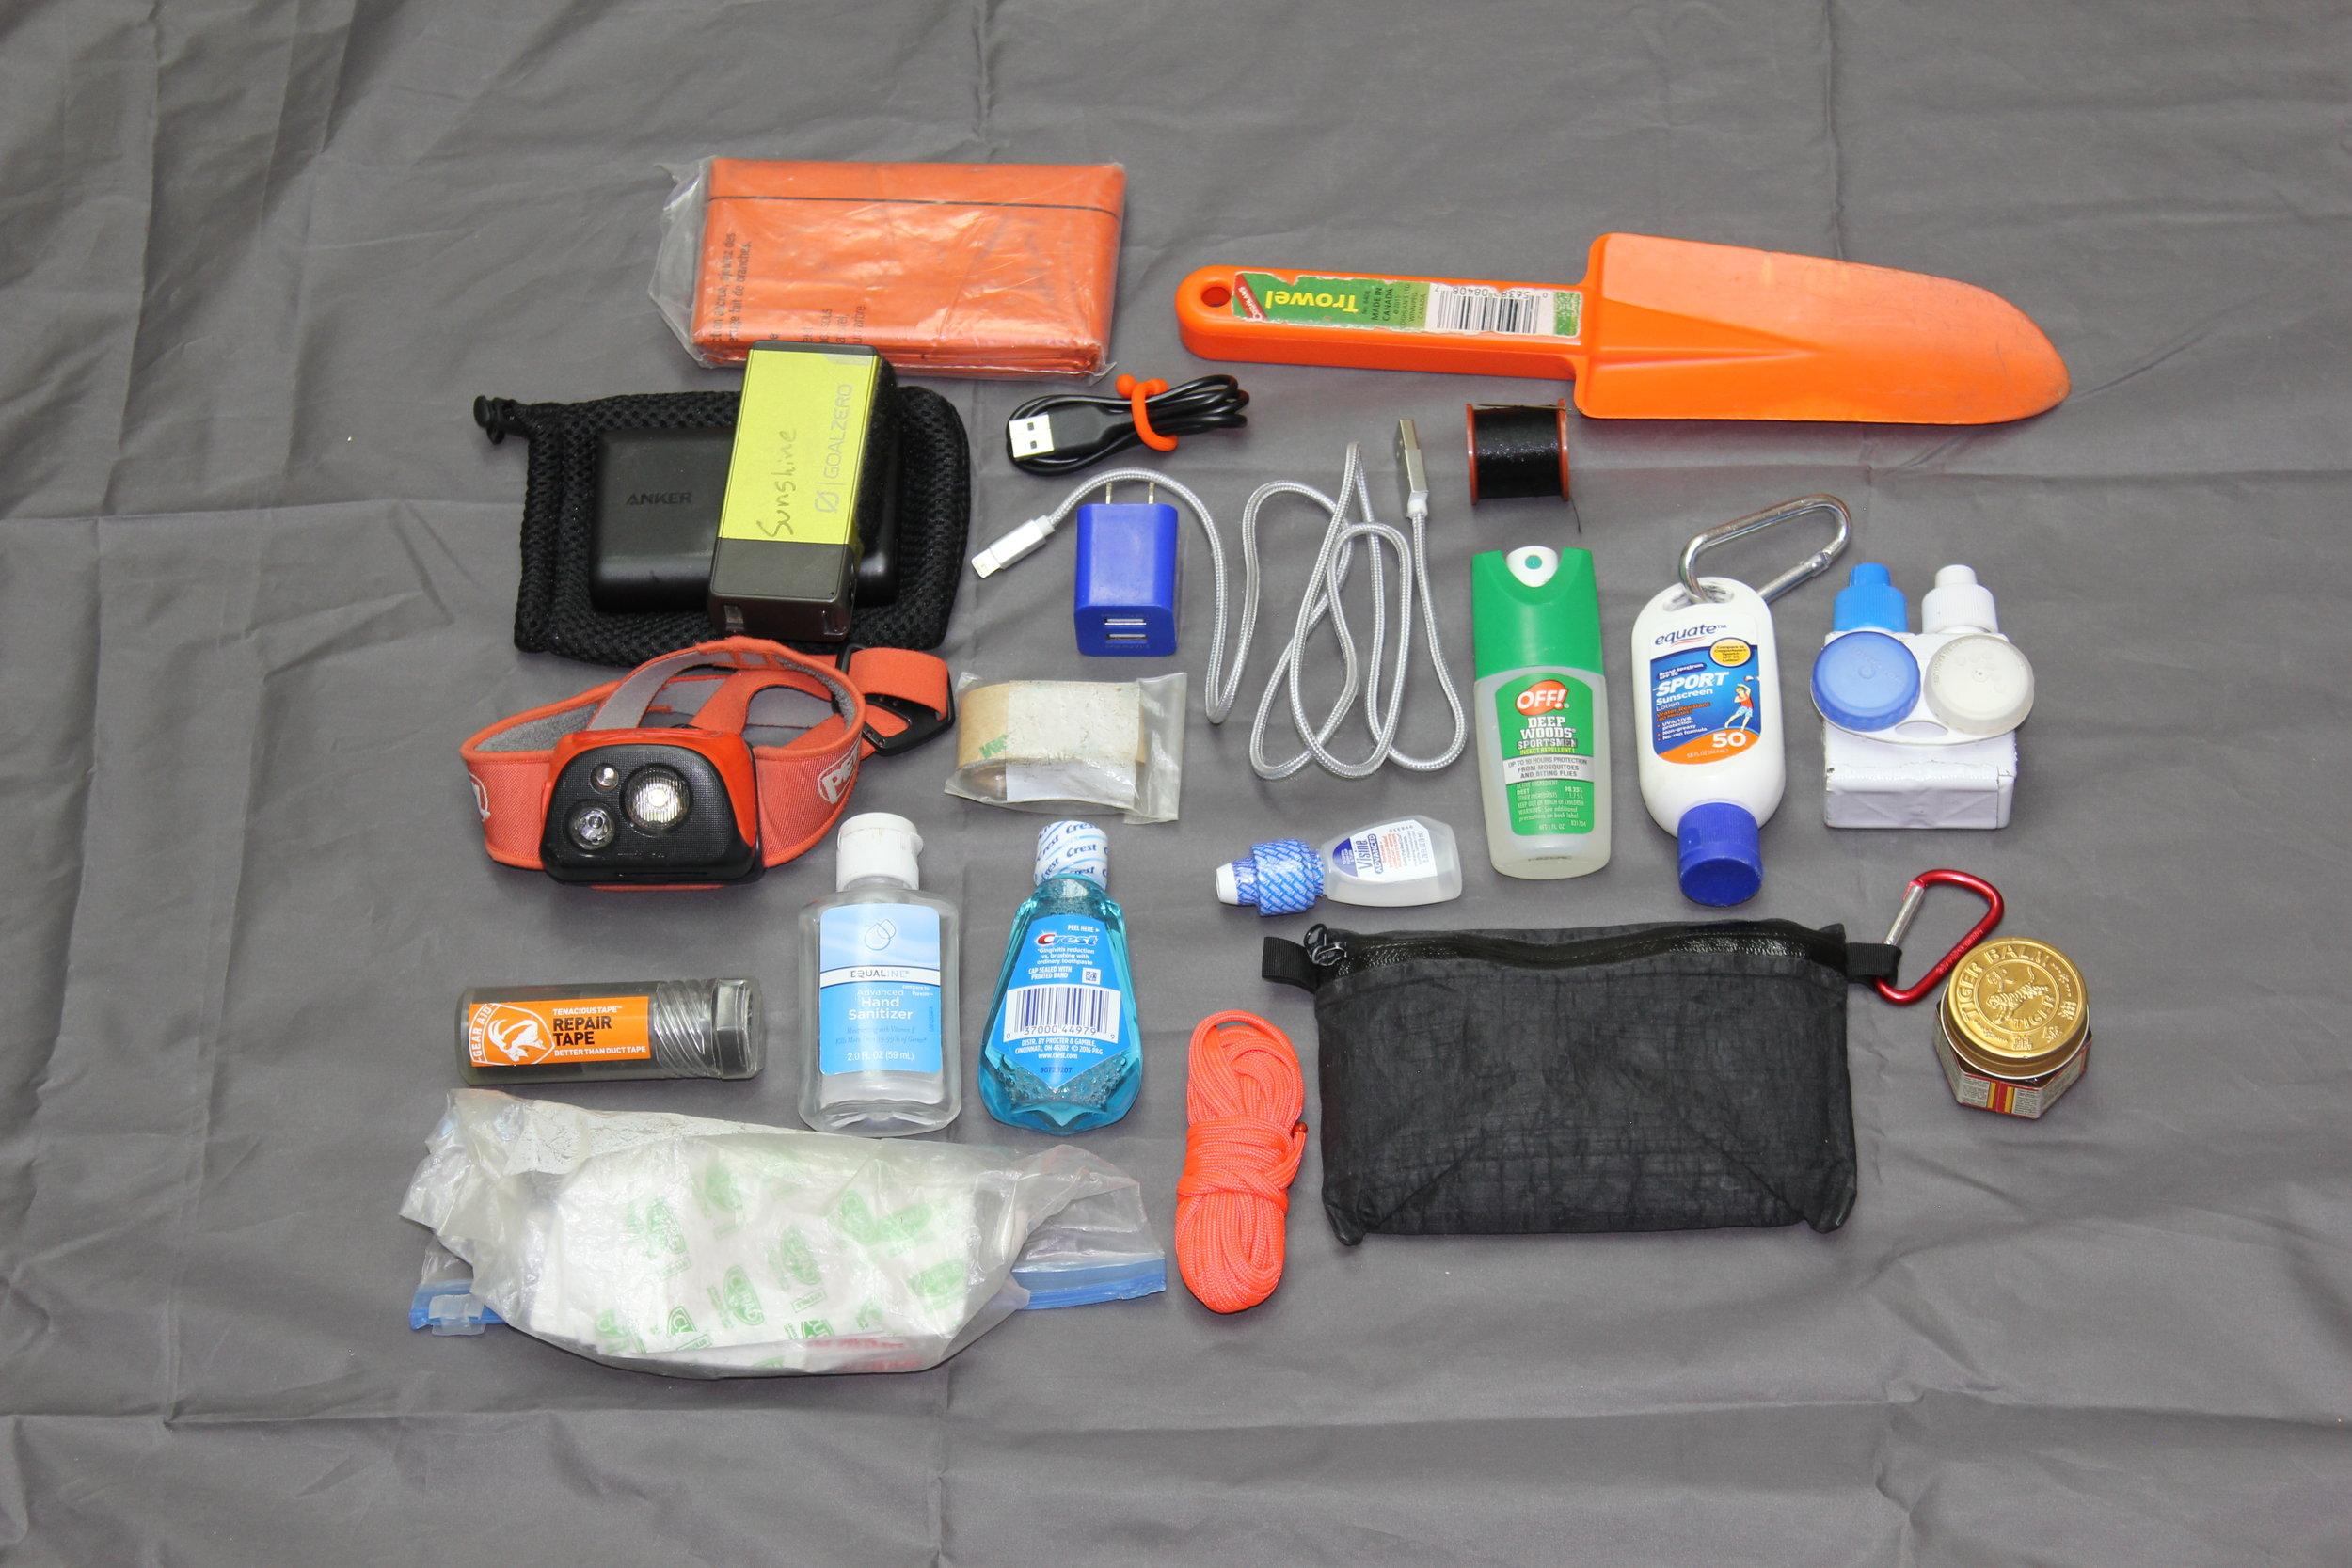 Anker and Goal Zero Battery Packs - 14,000 mA  Petzl Tikka R+ Headlamp  Aquamira  Toiletries and First Aid